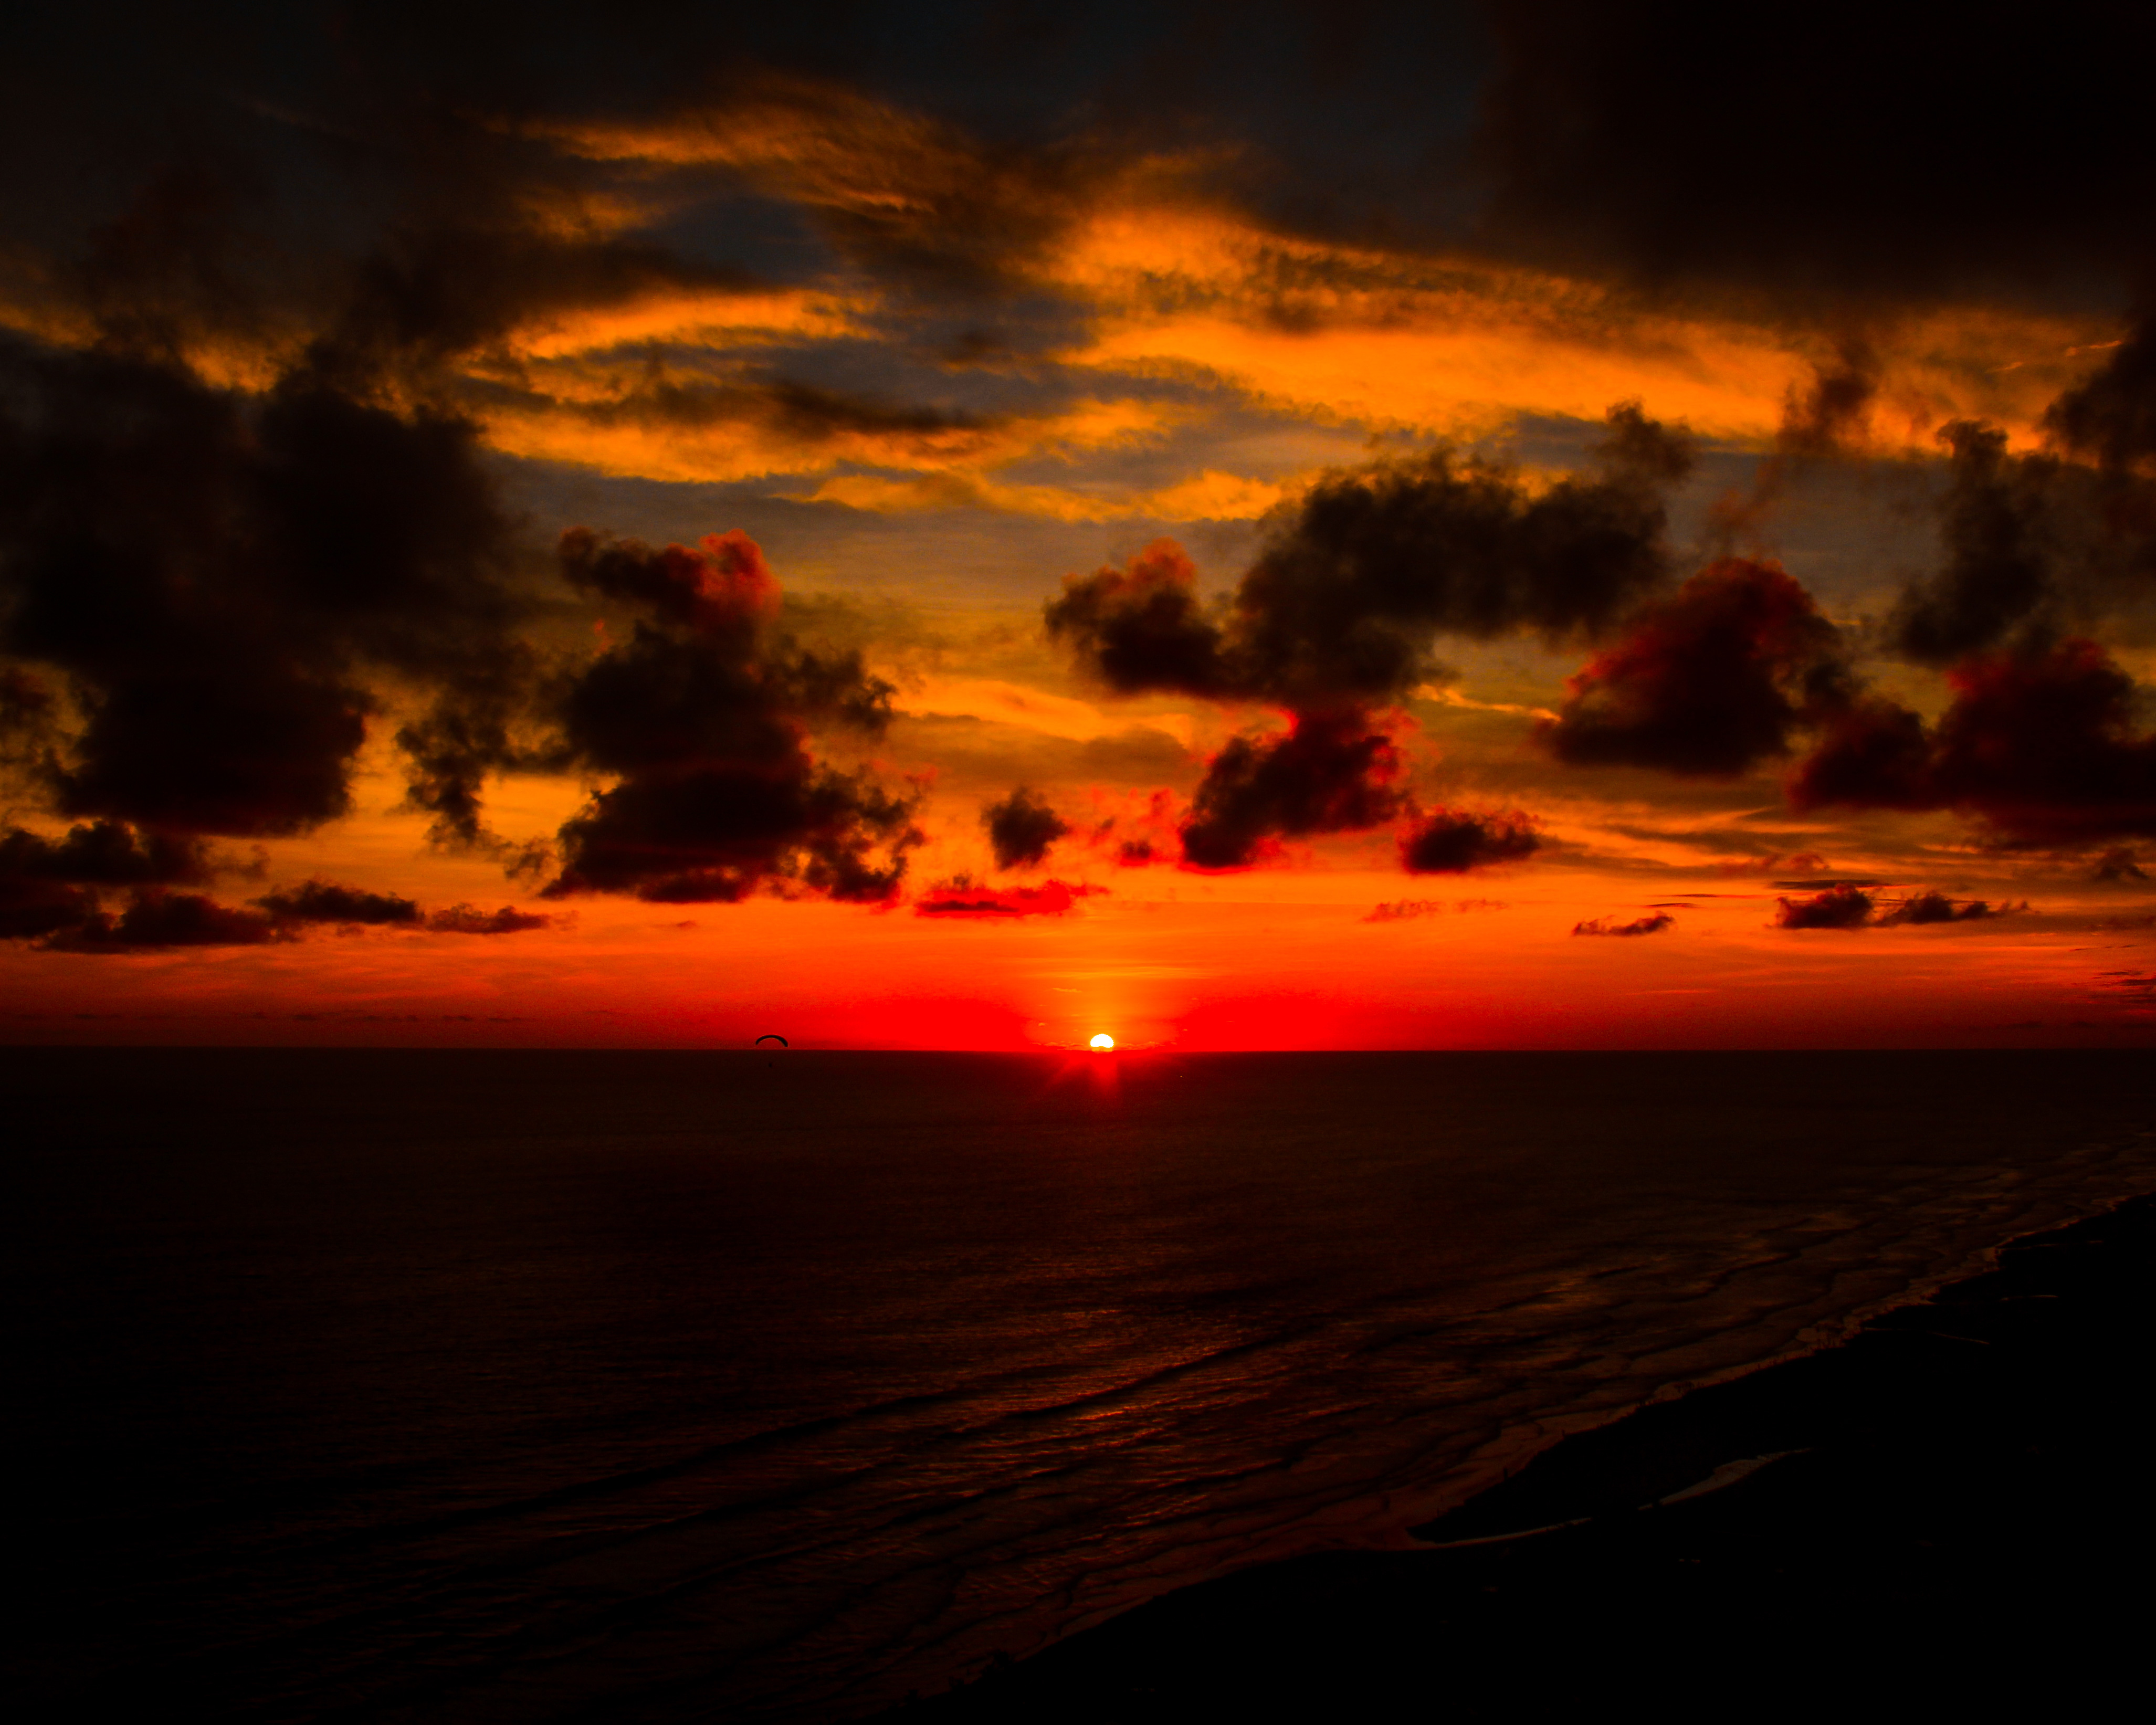 Deep Red Sunset Seashore 4k Hd Nature 4k Wallpapers